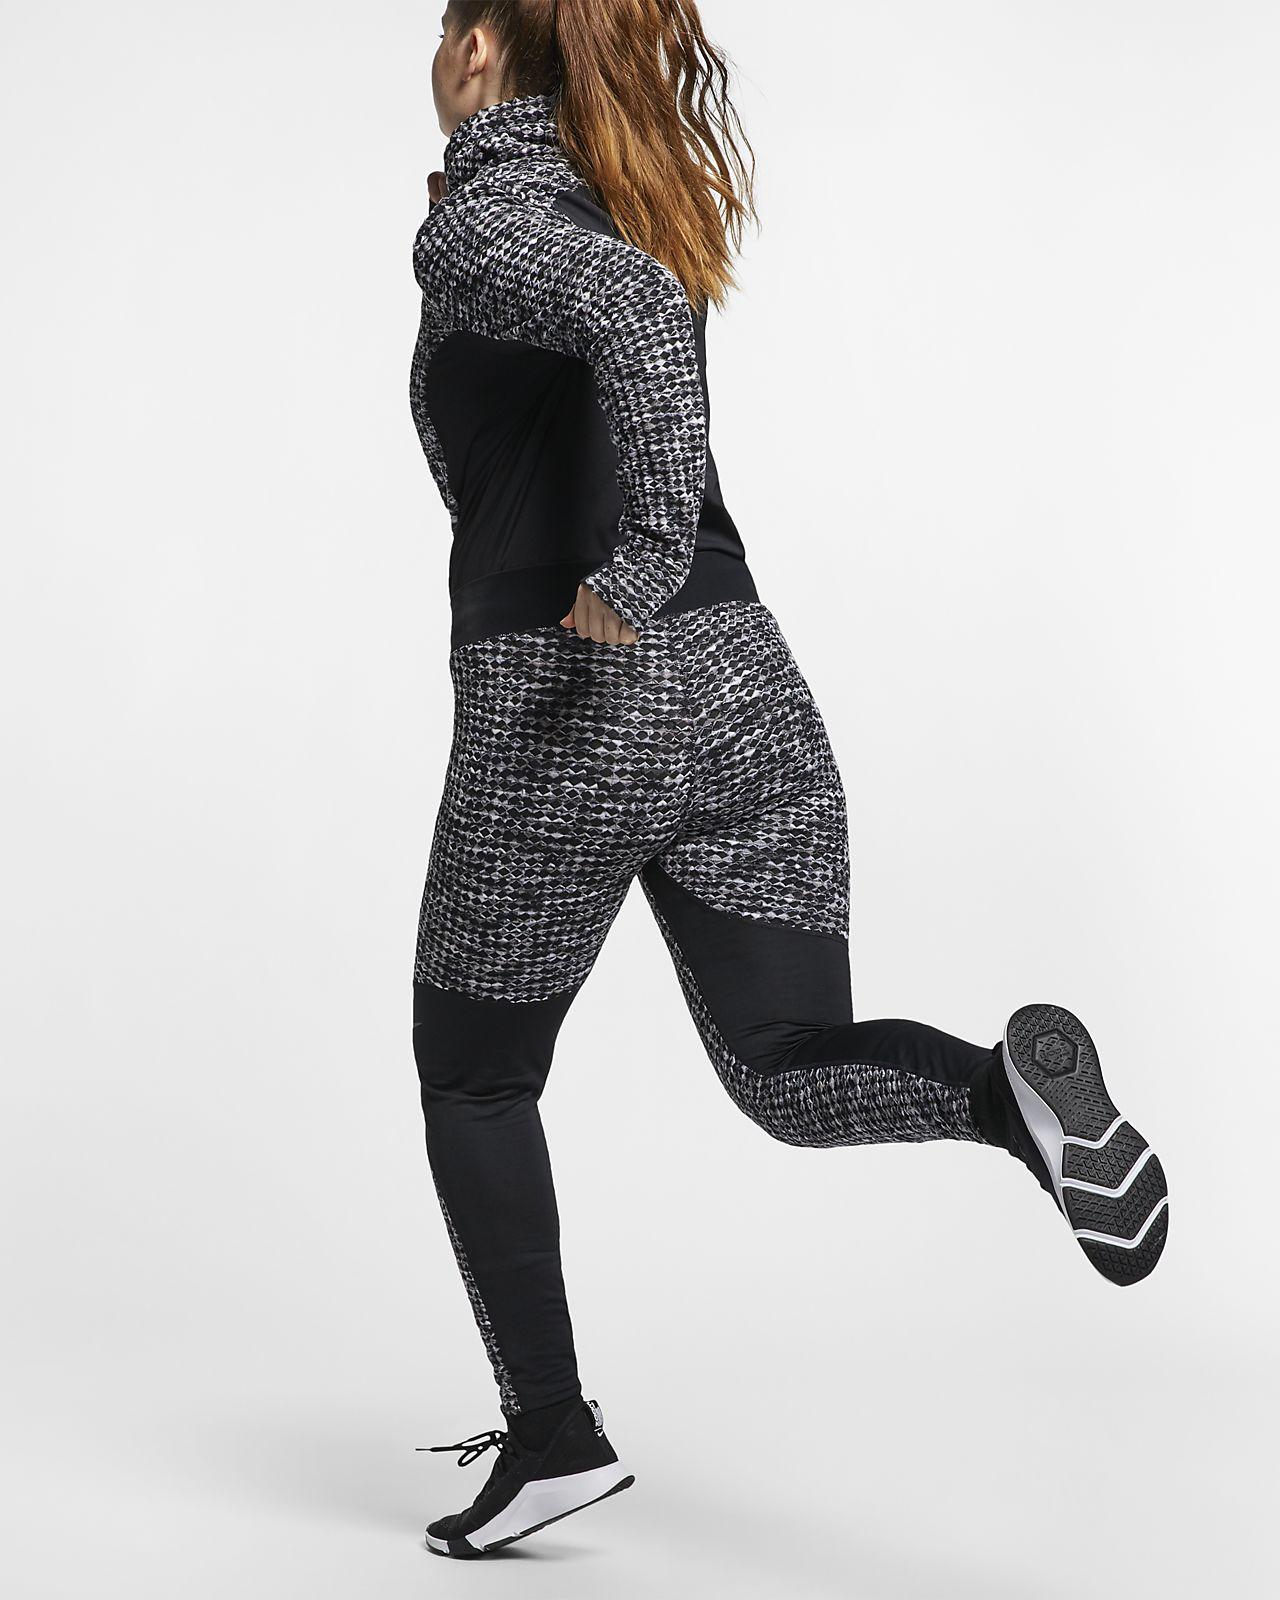 aa2ceefe35a Nike Pro HyperWarm (Plus Size) Women s Tights. Nike.com GB